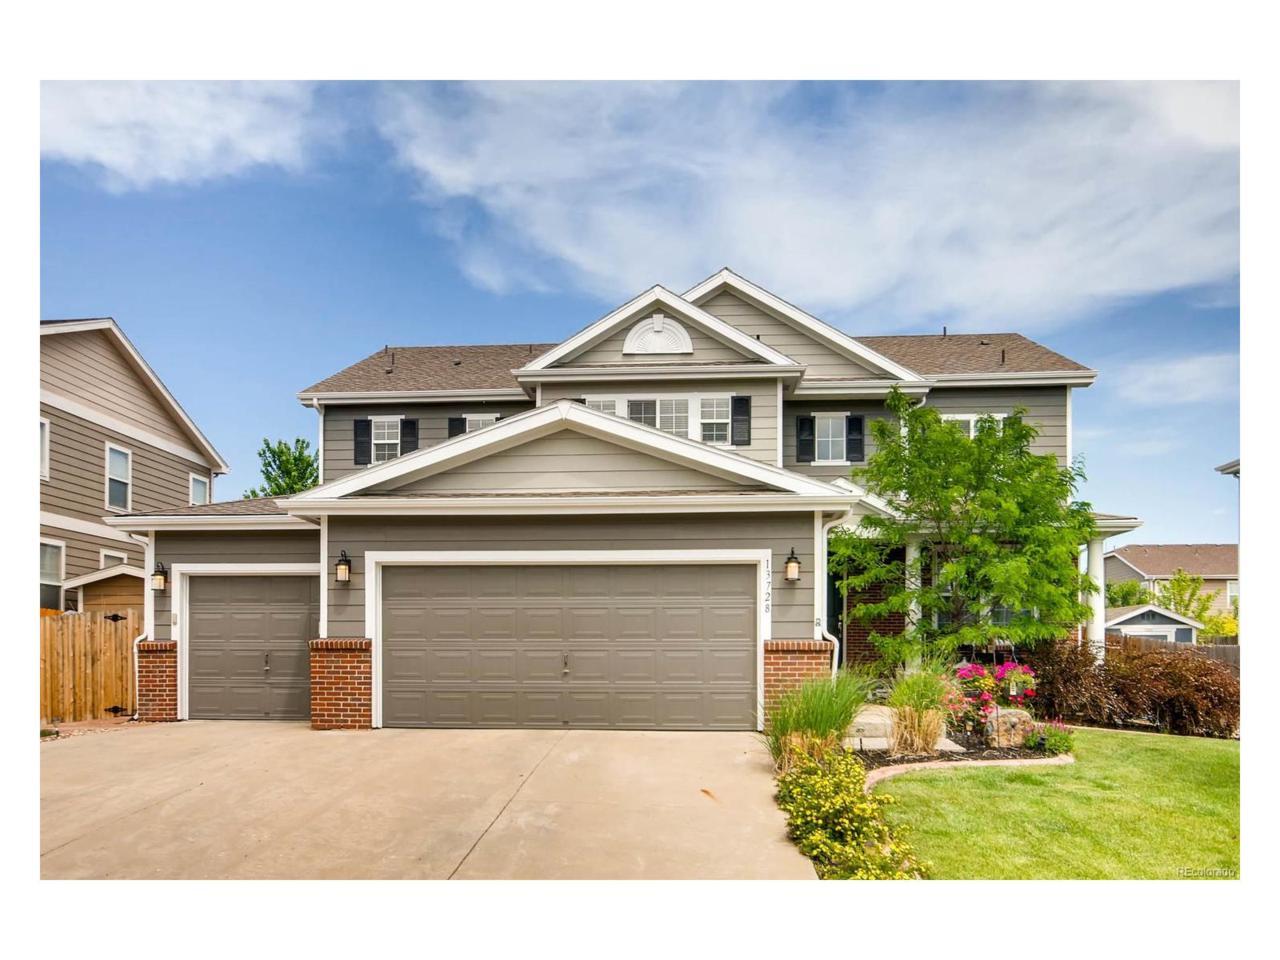 13728 Leyden Street, Thornton, CO 80602 (MLS #8778026) :: 8z Real Estate